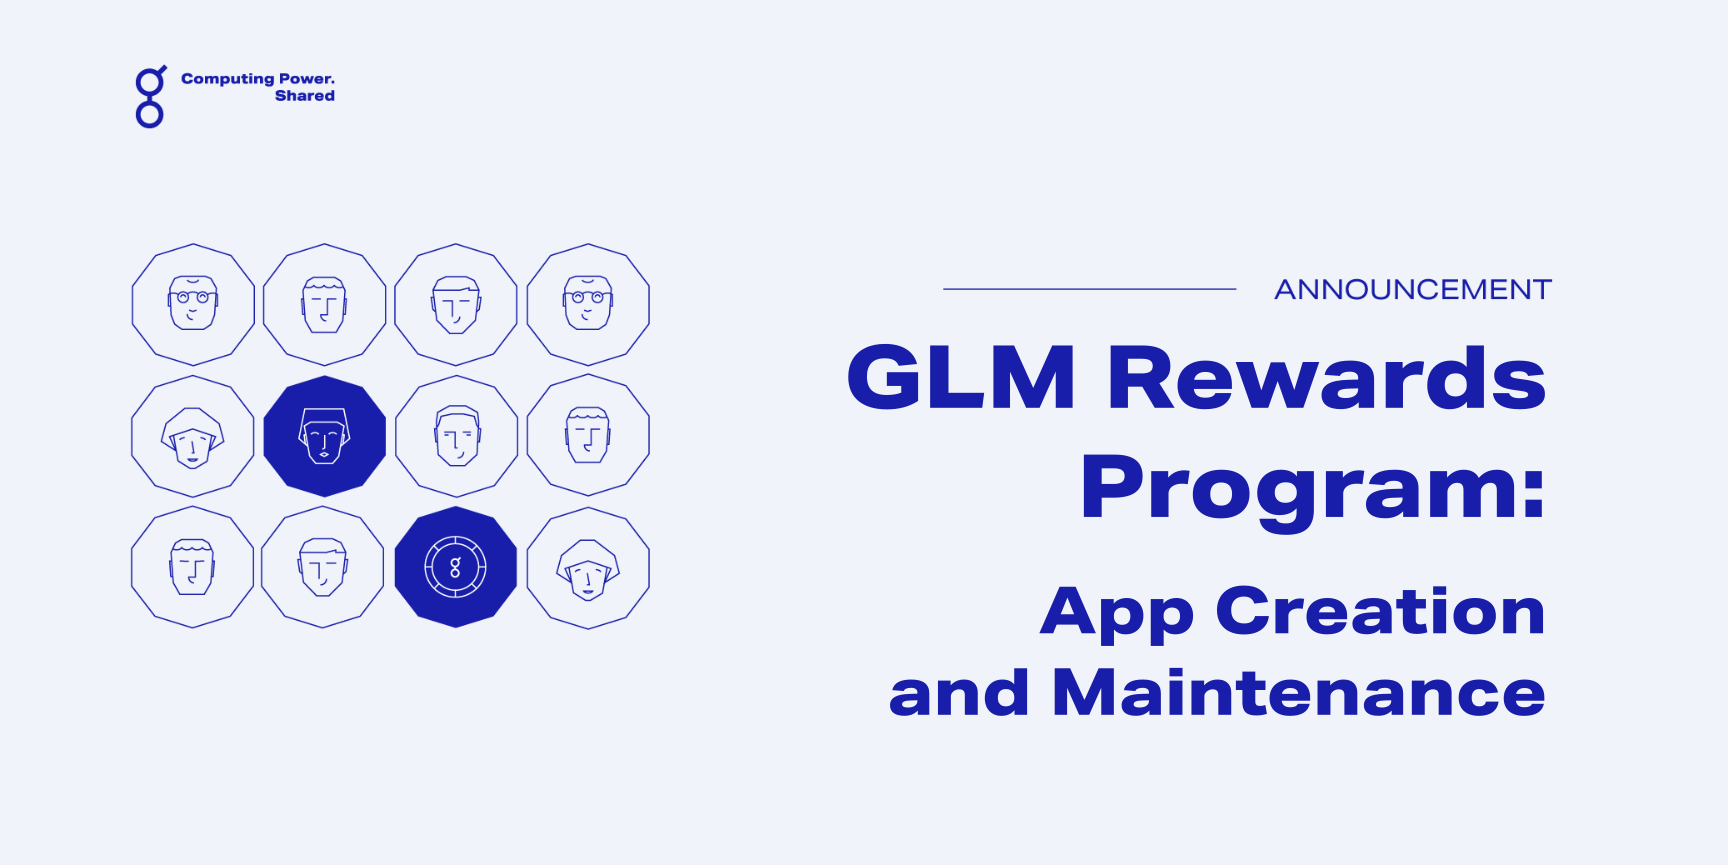 GLM Rewards Program - Application Creation and Maintenance